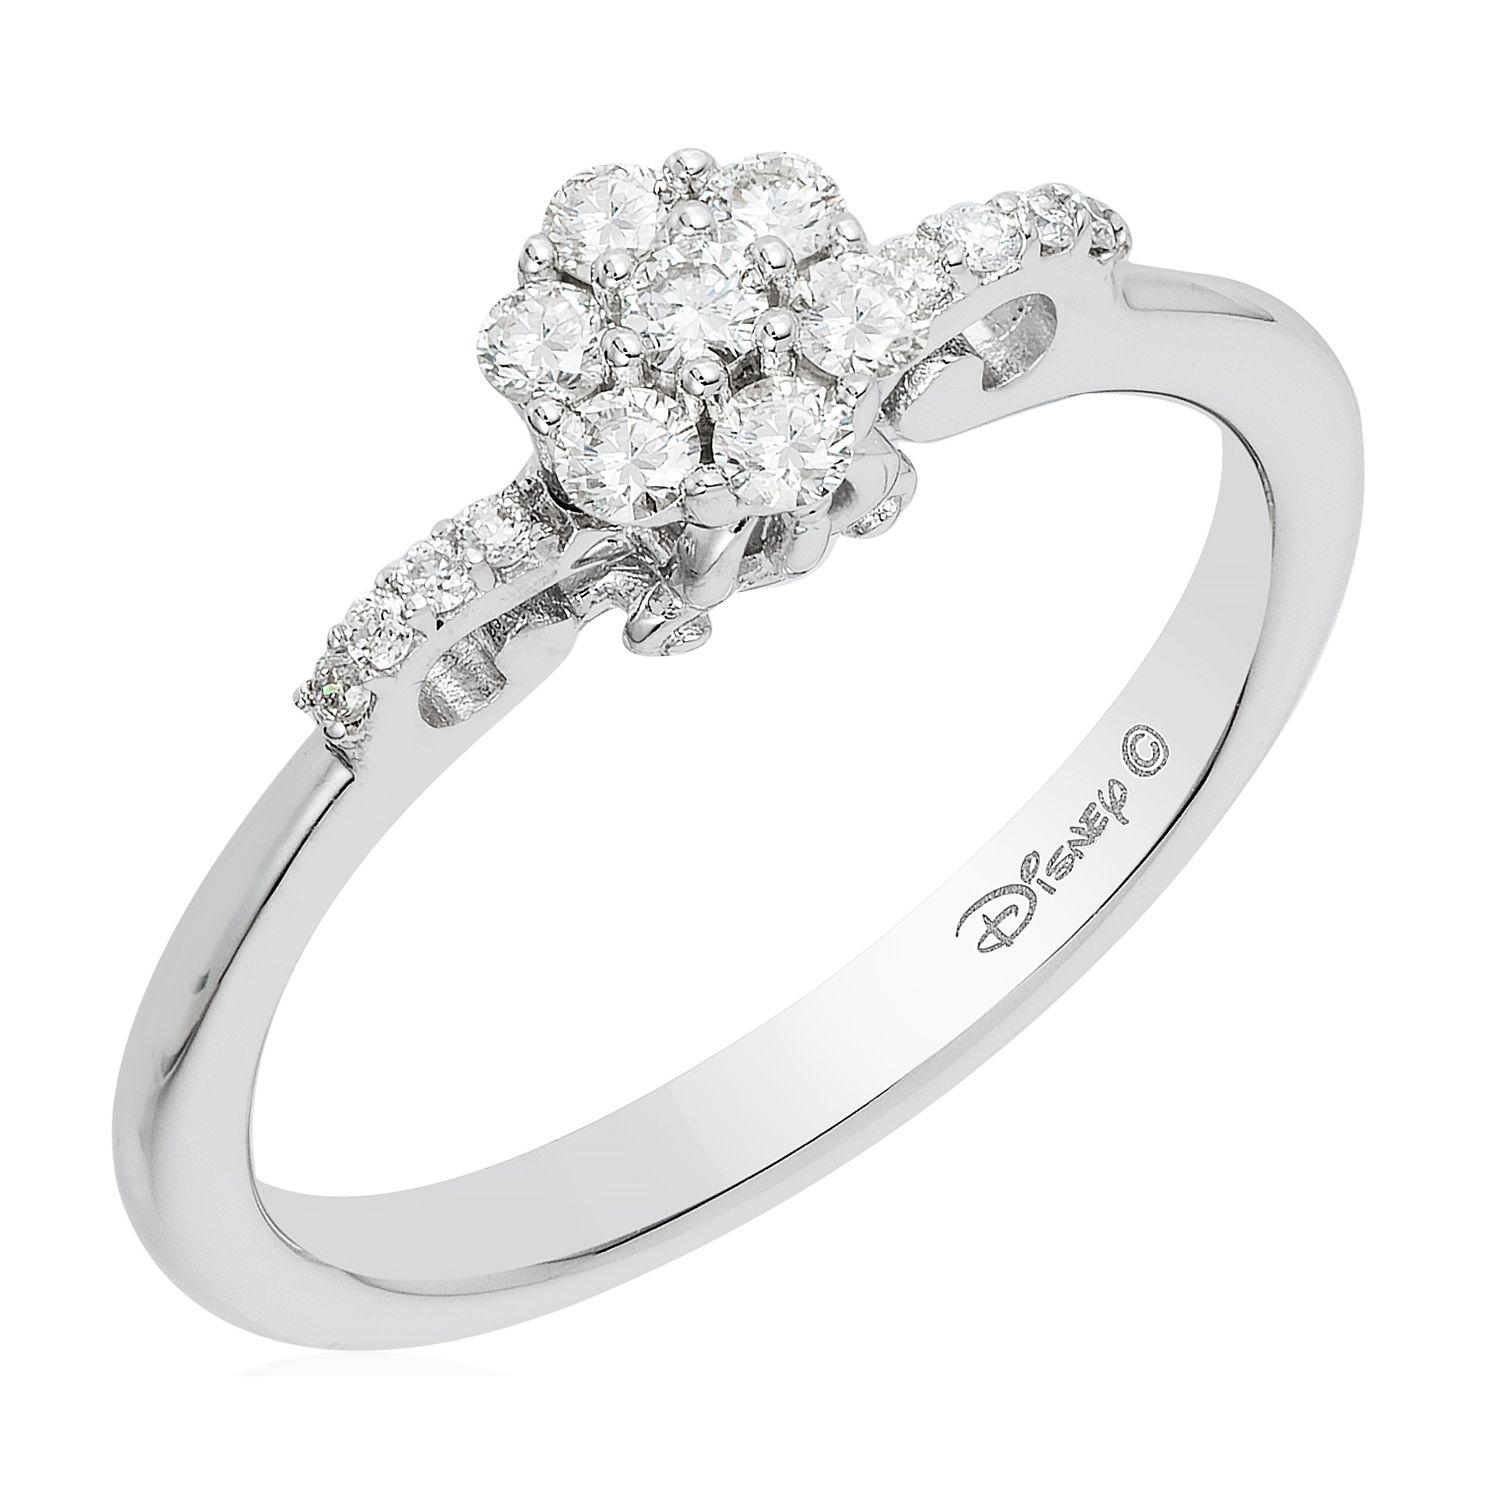 Enchanted Disney Silver 1 4 Carat Diamond Cinderella Ring